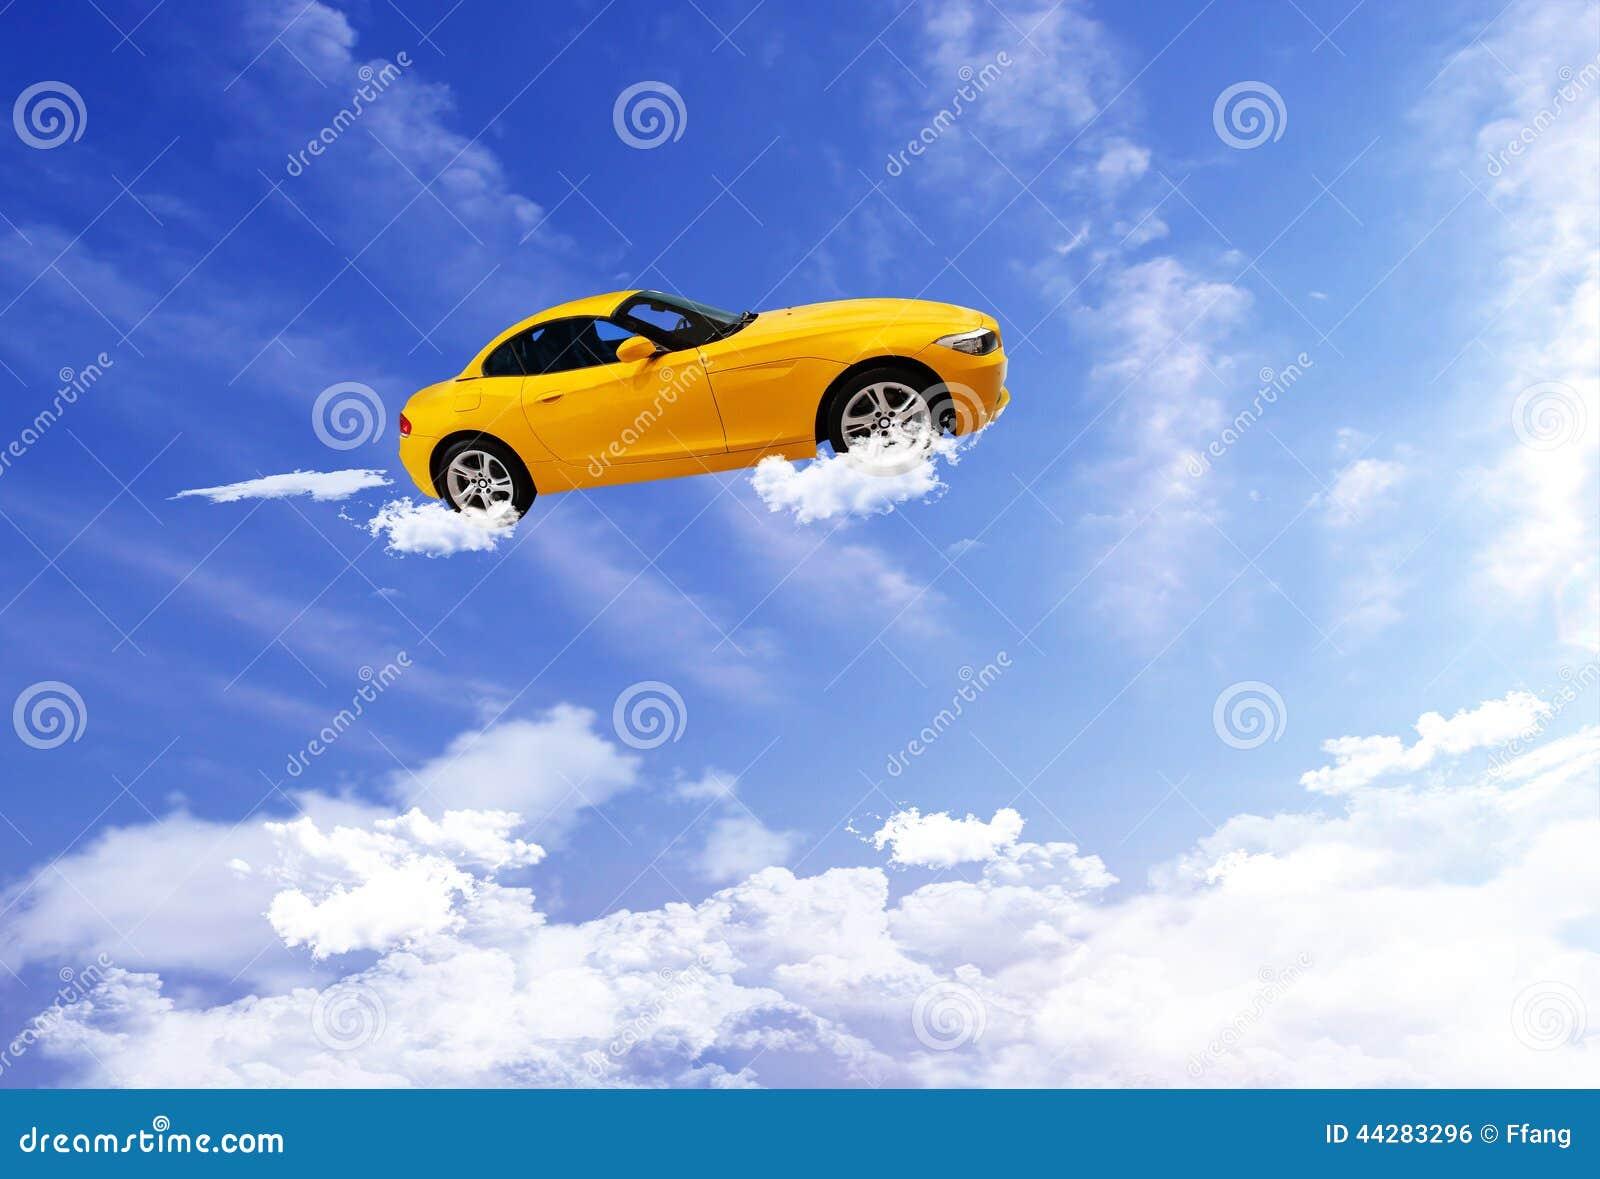 Car Flying On Blue Sky Background. Stock Photo - Image